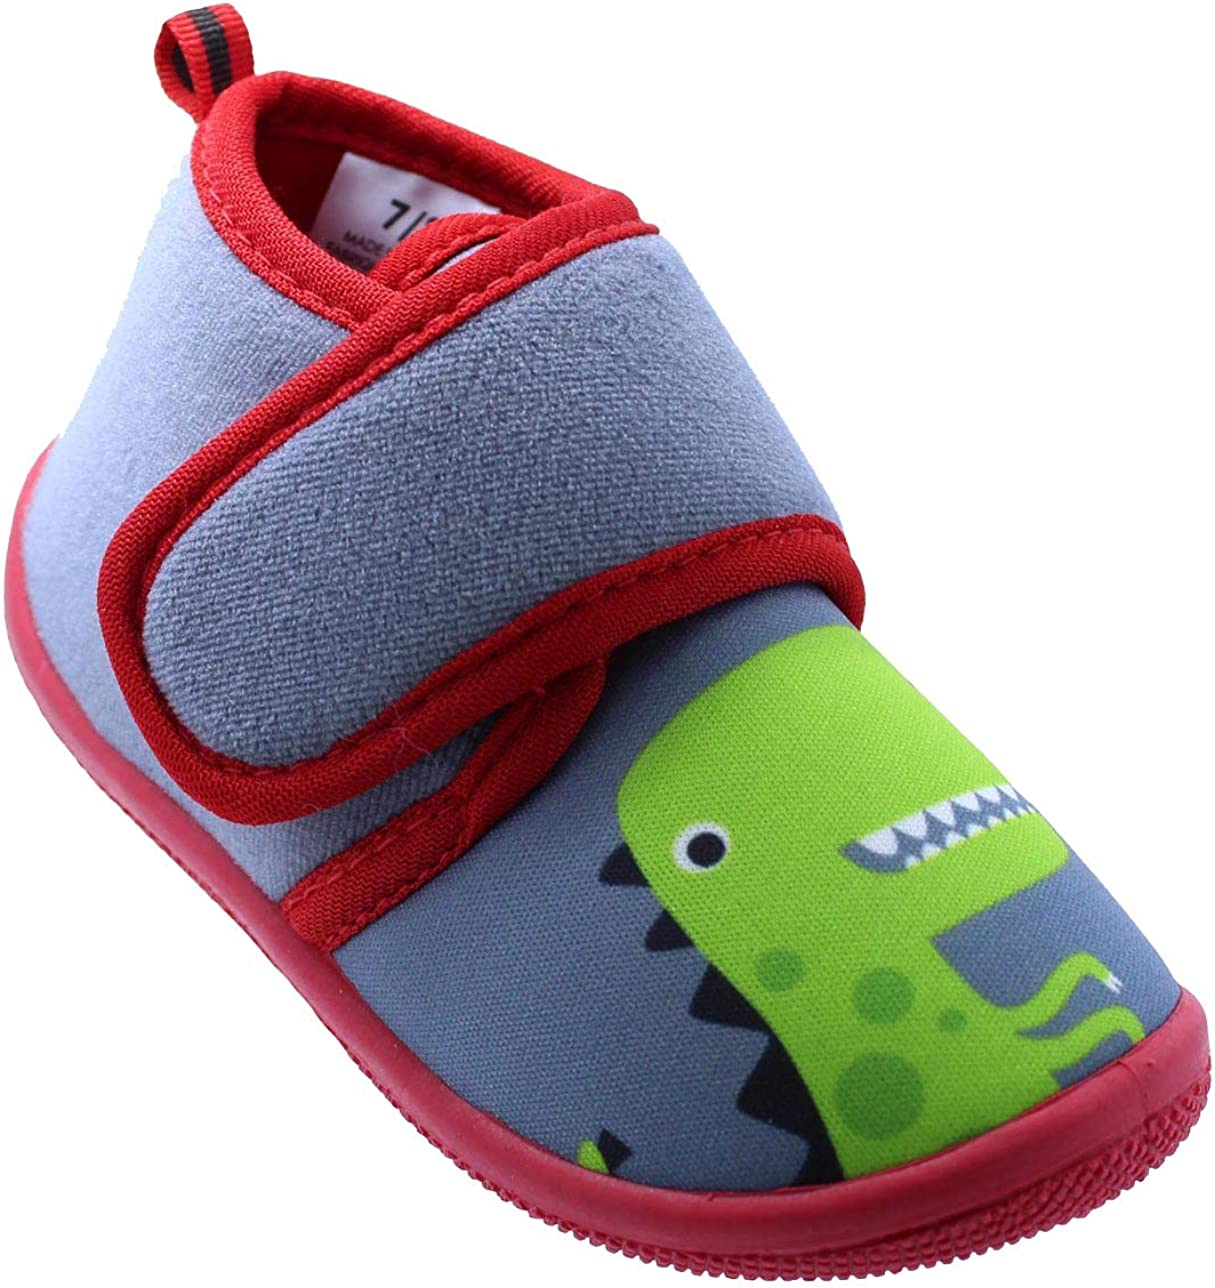 Black and White Toddler Boys Dinosaur Daycare Slippers